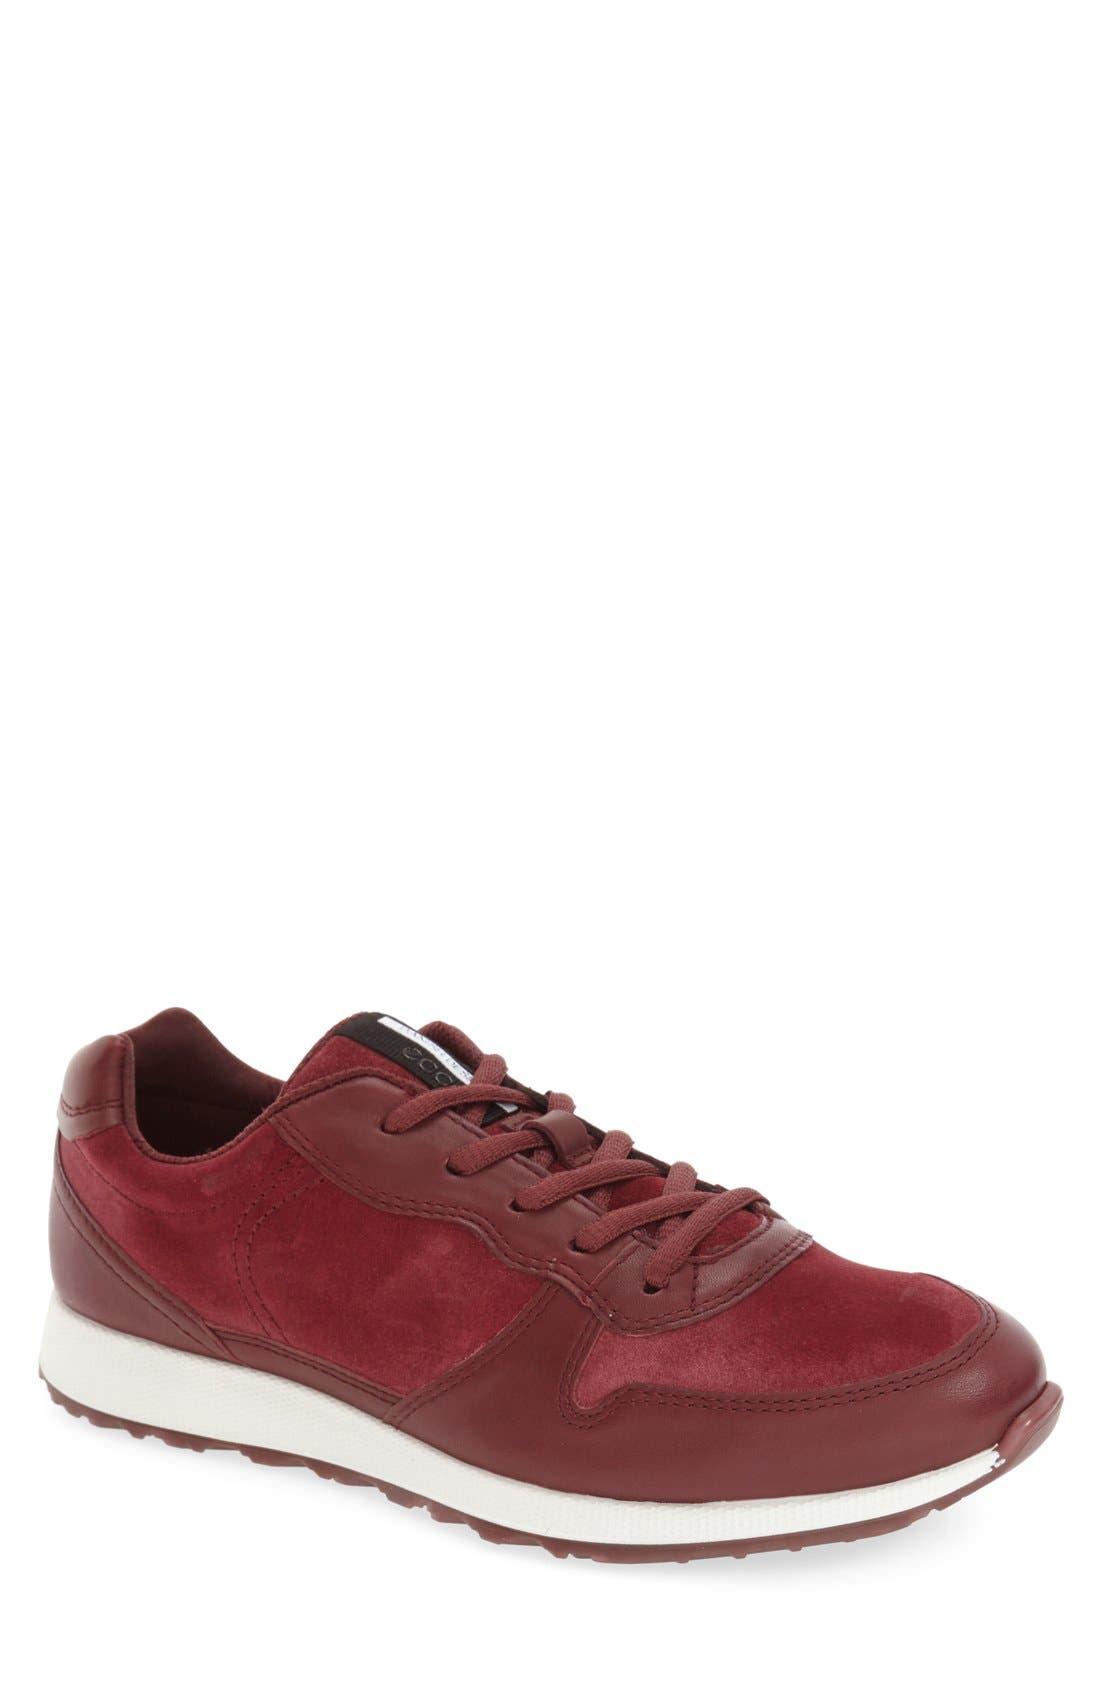 Main Image - ECCO 'Sneak' Sneaker (Women)